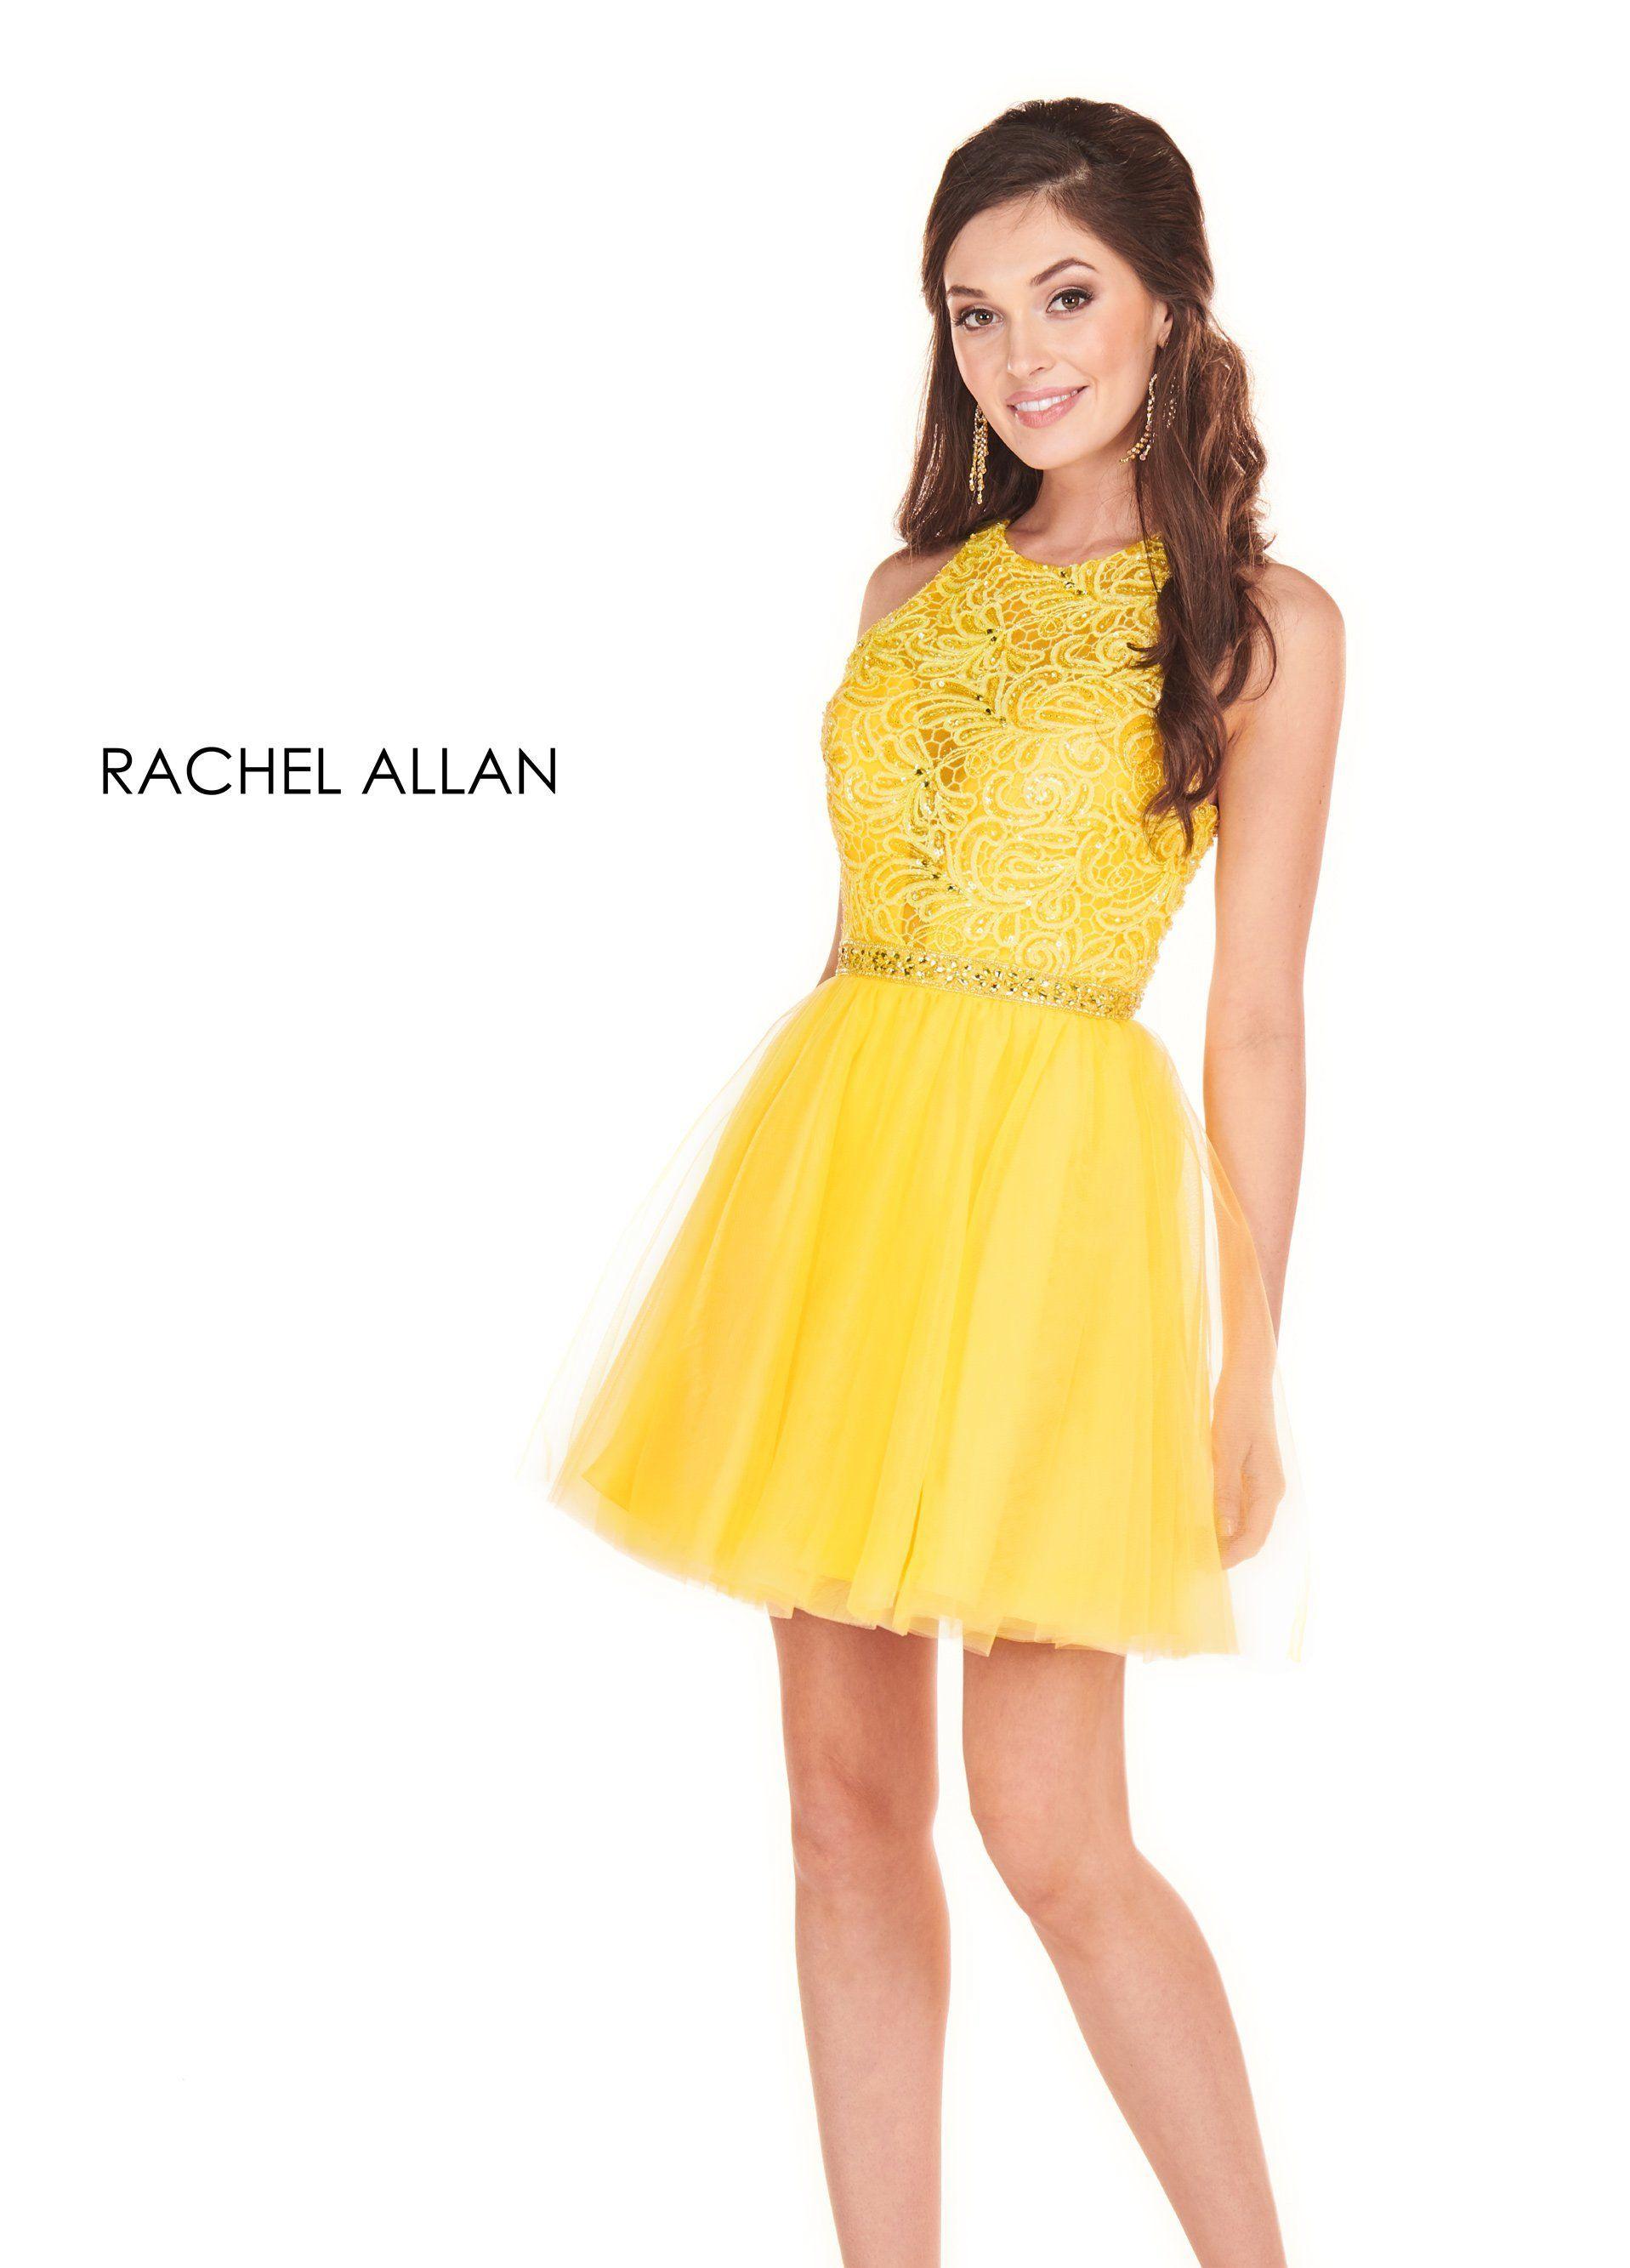 Rachel Allan 4054 Dress In 2021 Yellow Bridesmaid Dresses Short Yellow Homecoming Dresses Prom Dresses Yellow [ 2667 x 1917 Pixel ]